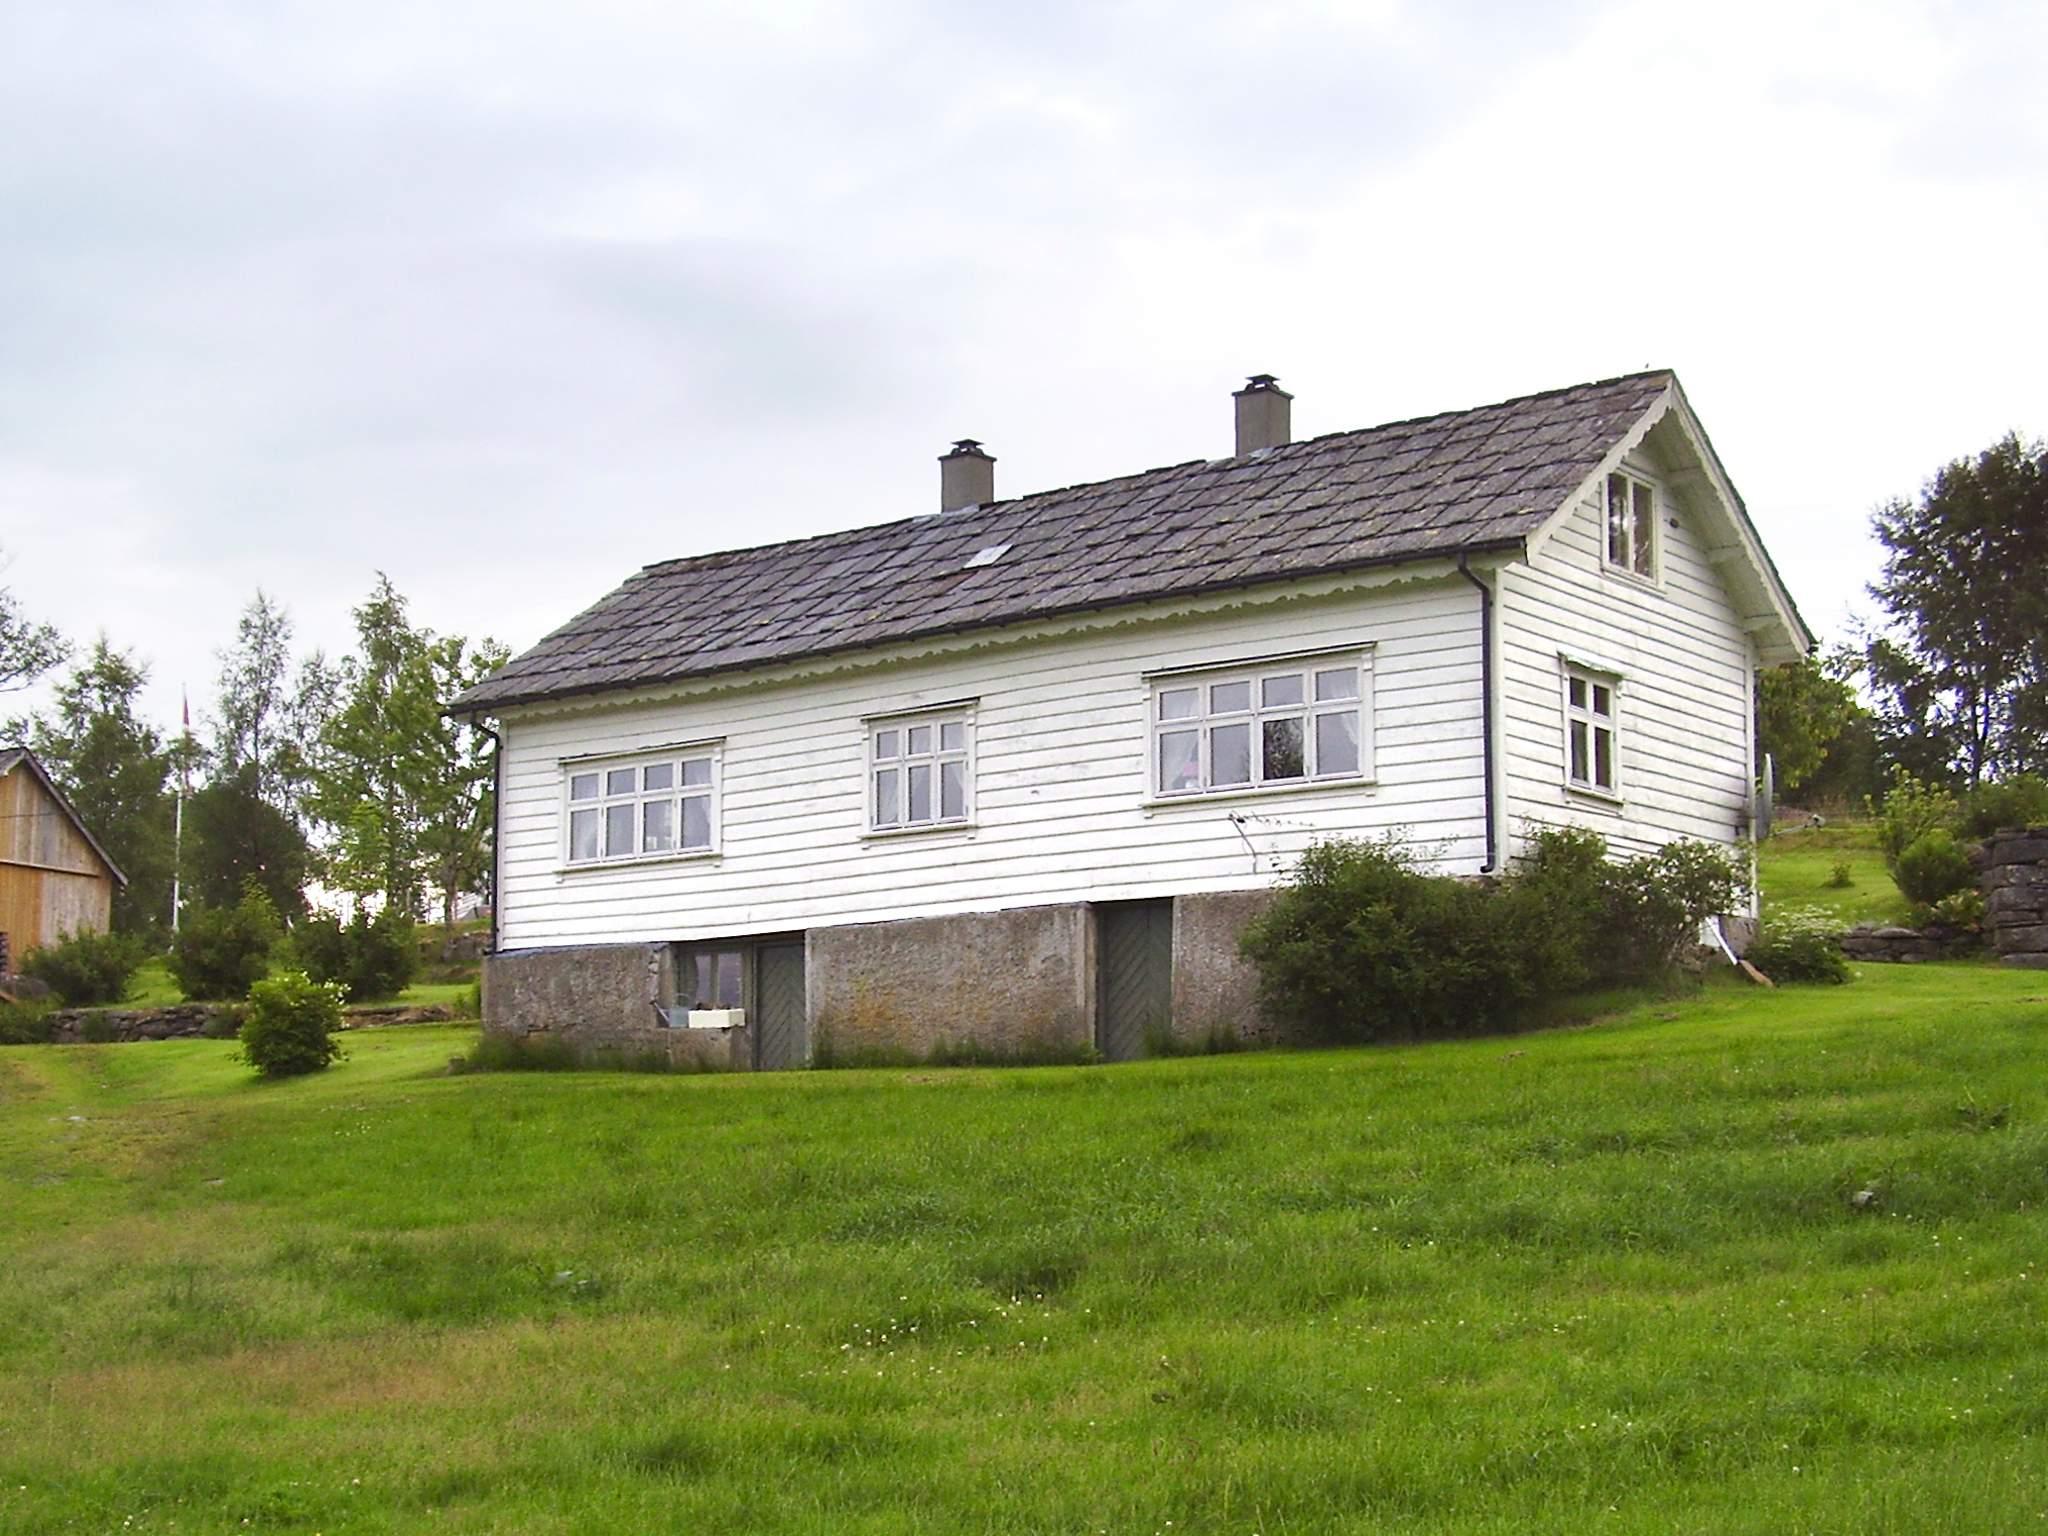 Ferienhaus Etne (83639), Etne, Hordaland - Hardangerfjord, Westnorwegen, Norwegen, Bild 1